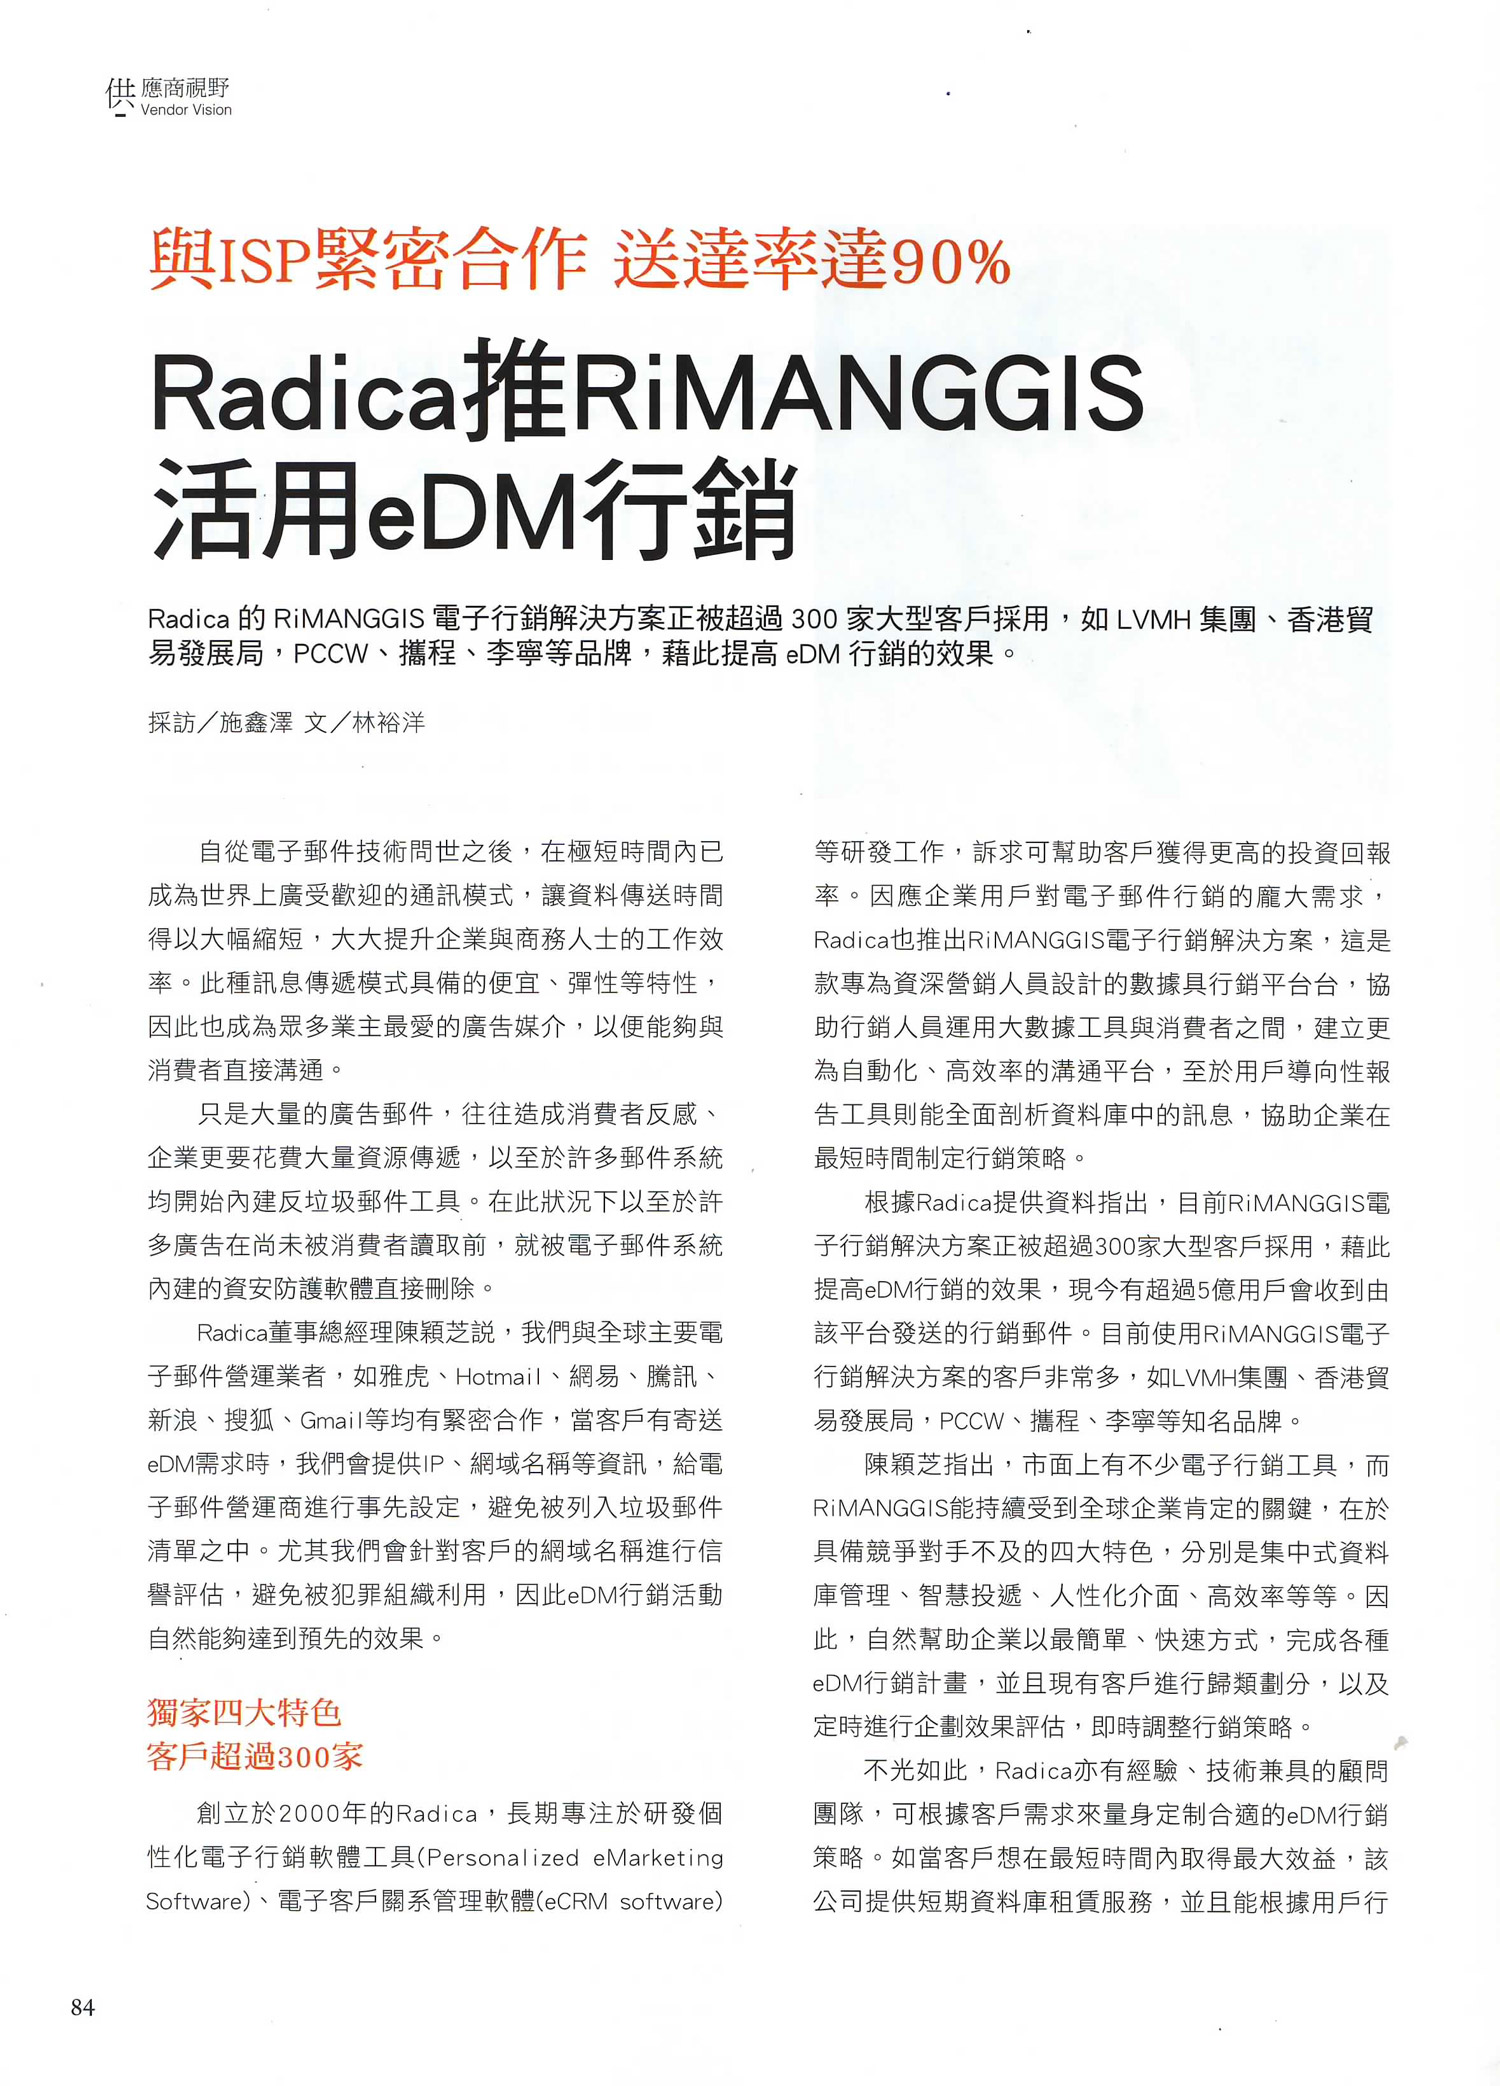 Taiwan Press release - 1 .jpg